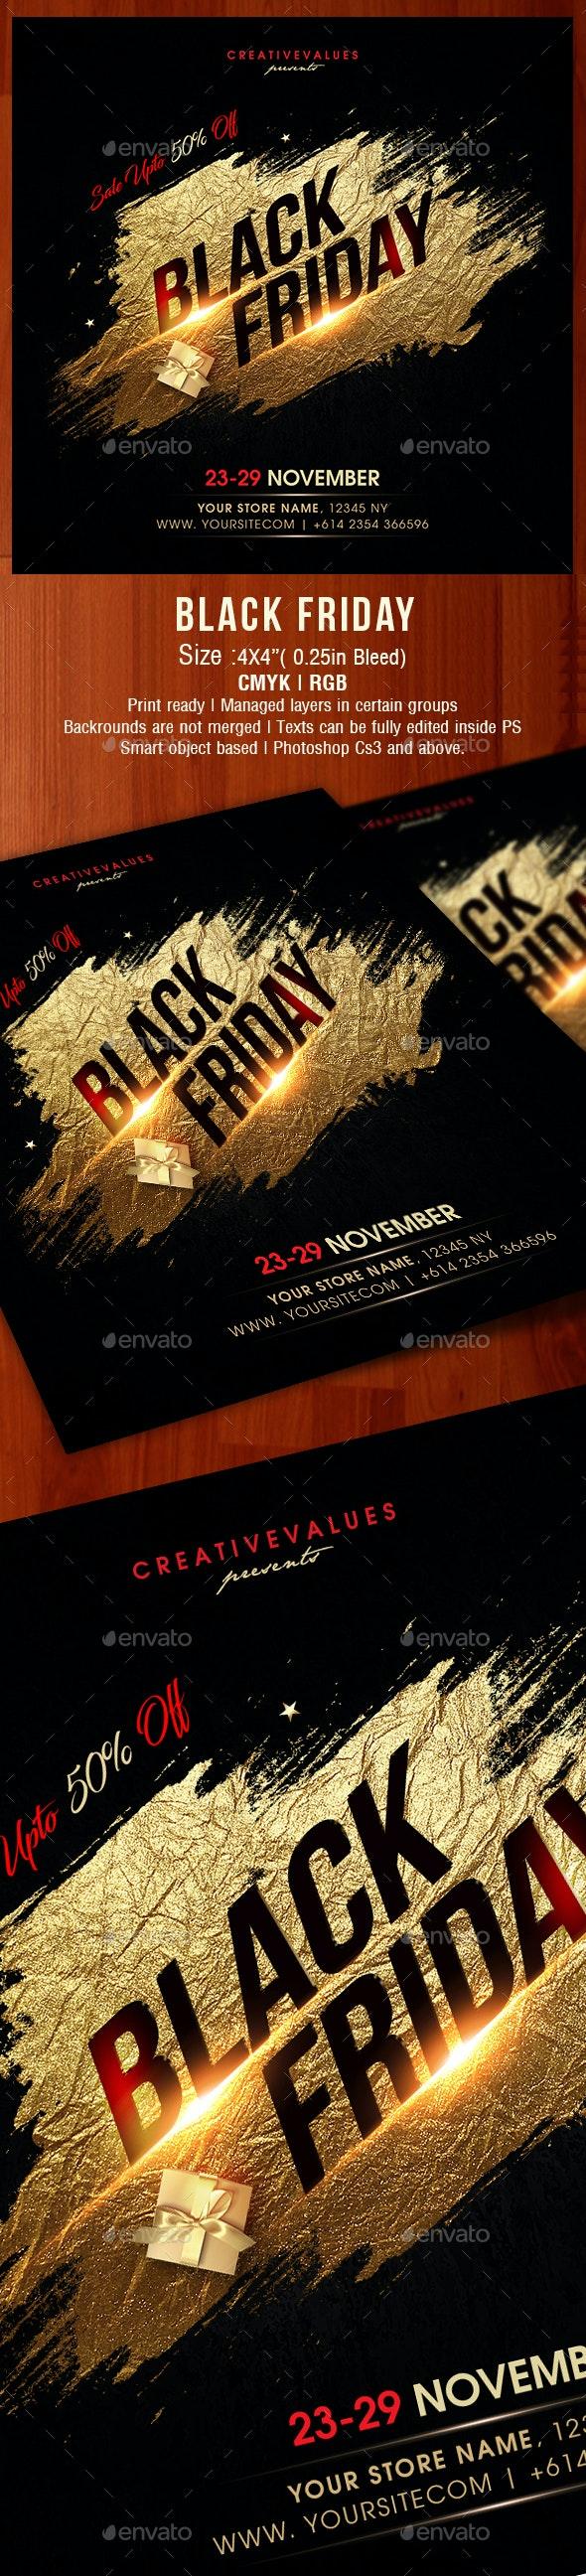 Black Friday - Holidays Events